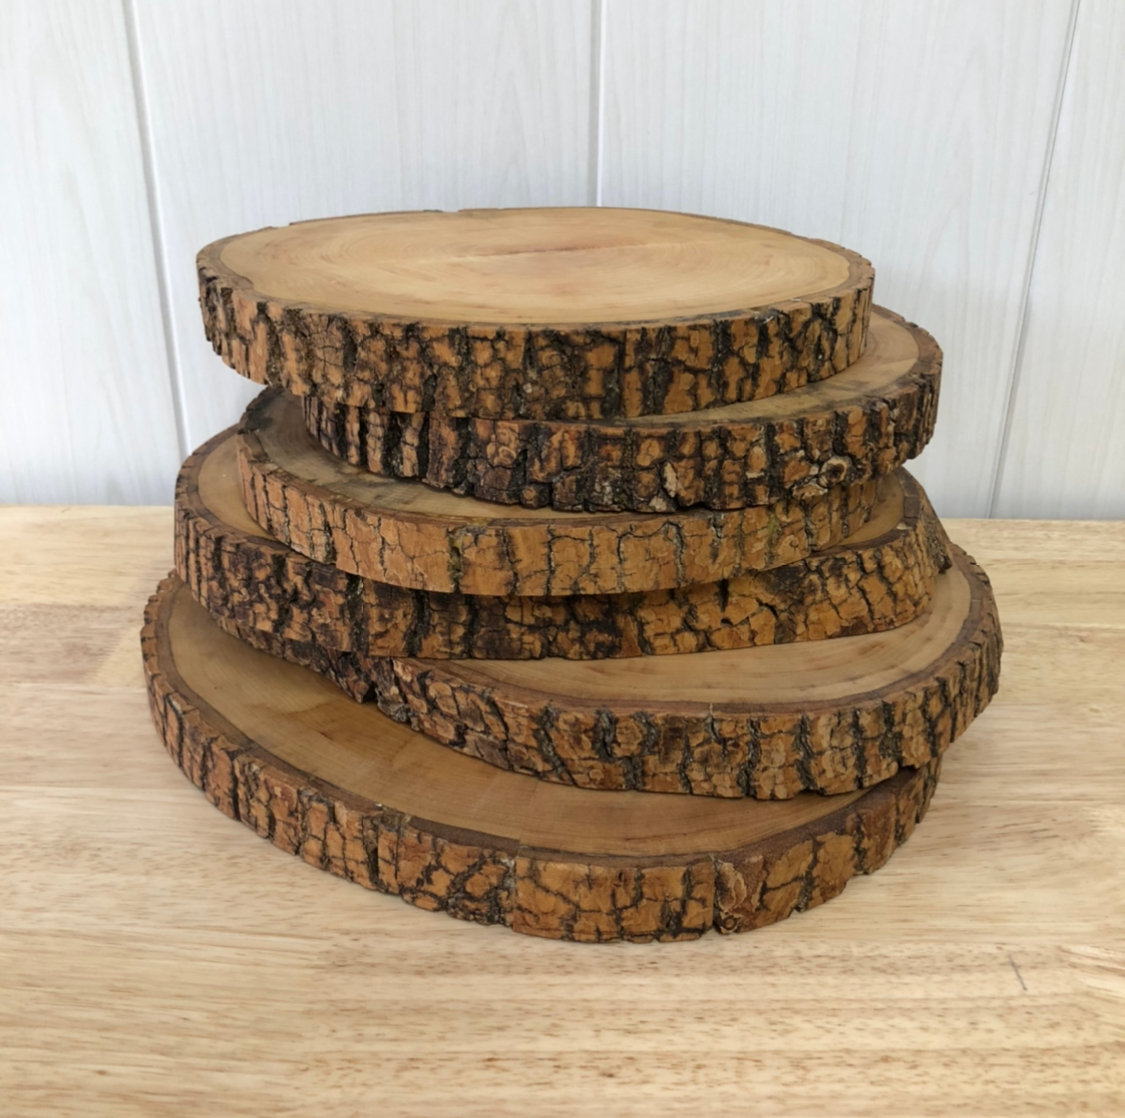 Round Wood Slices